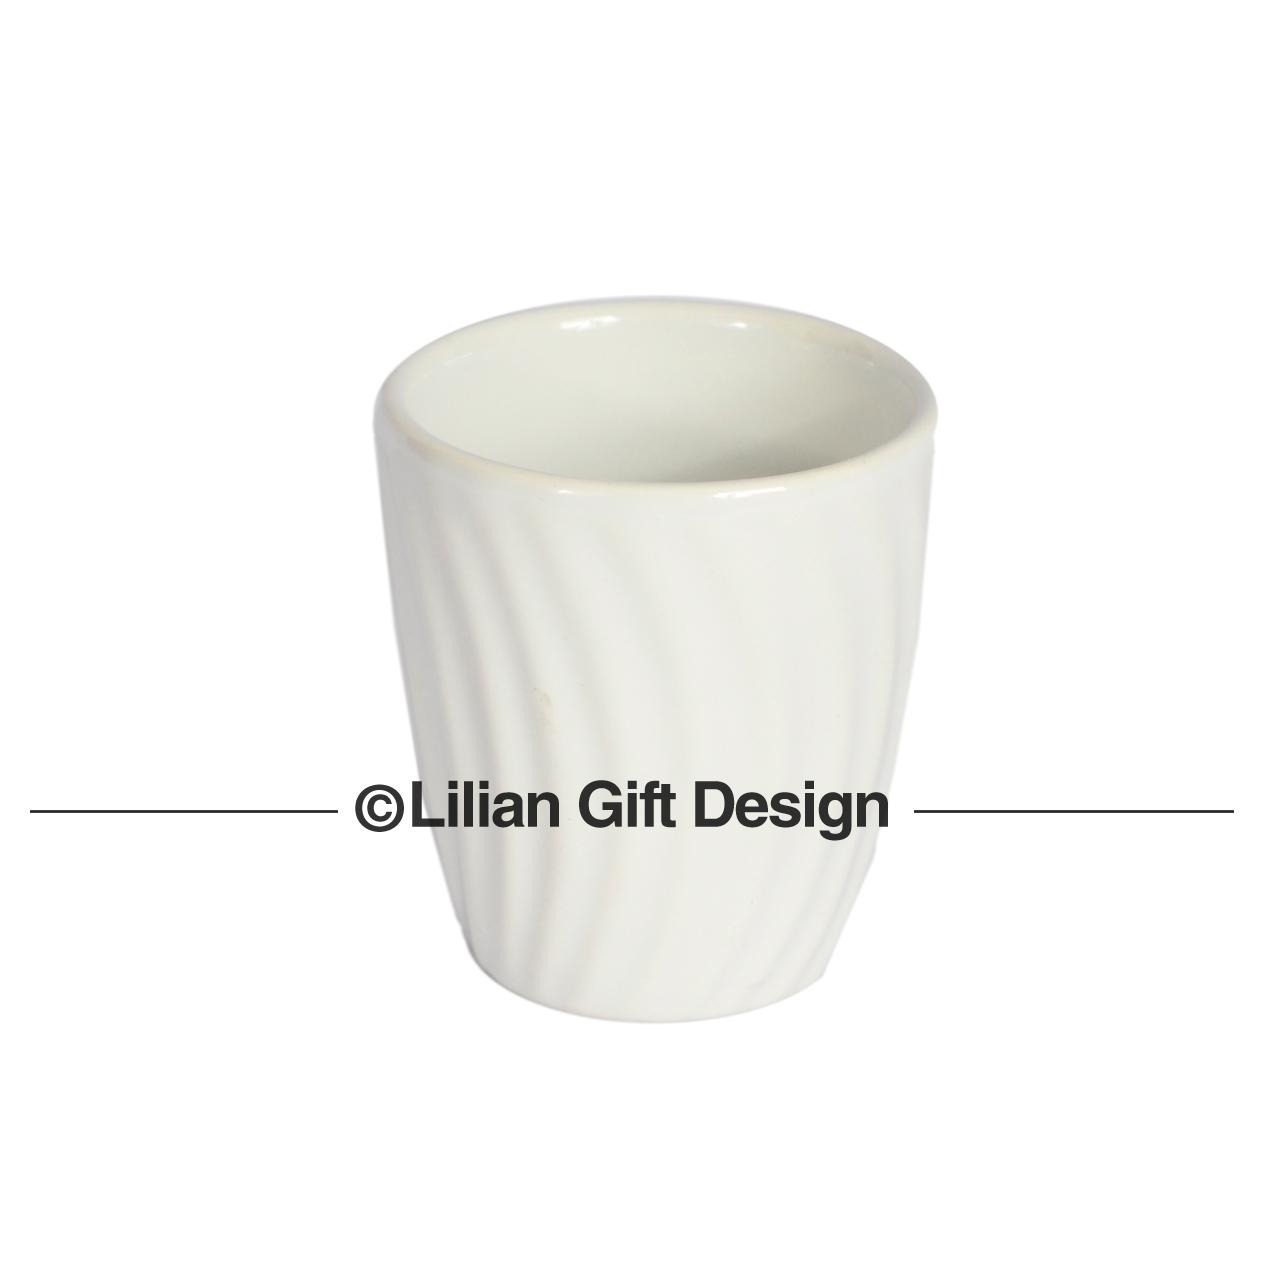 Vaso cerâmica branco 7.5x7cm